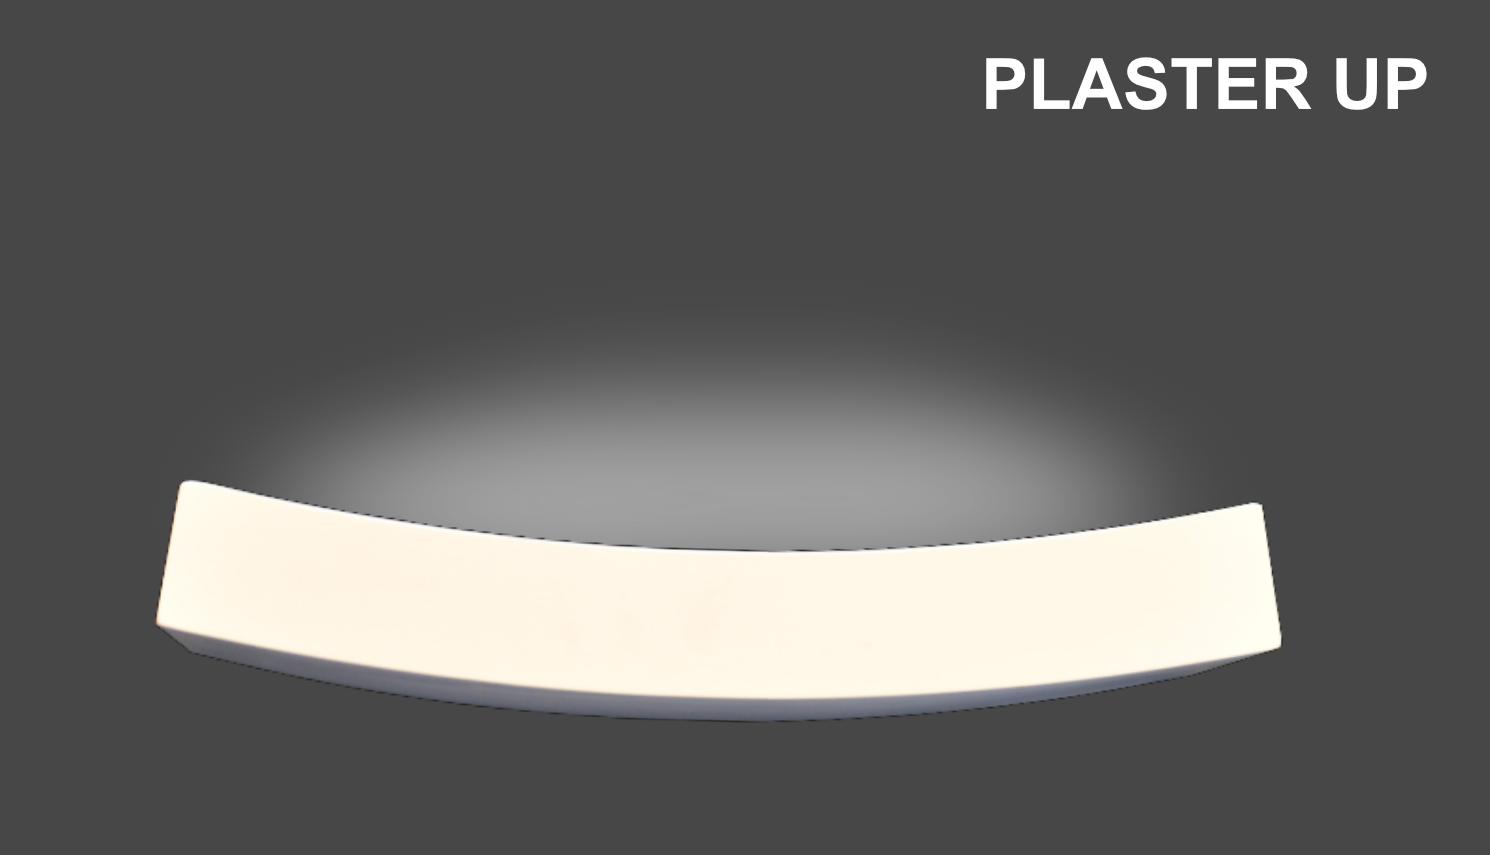 PLASTER UP